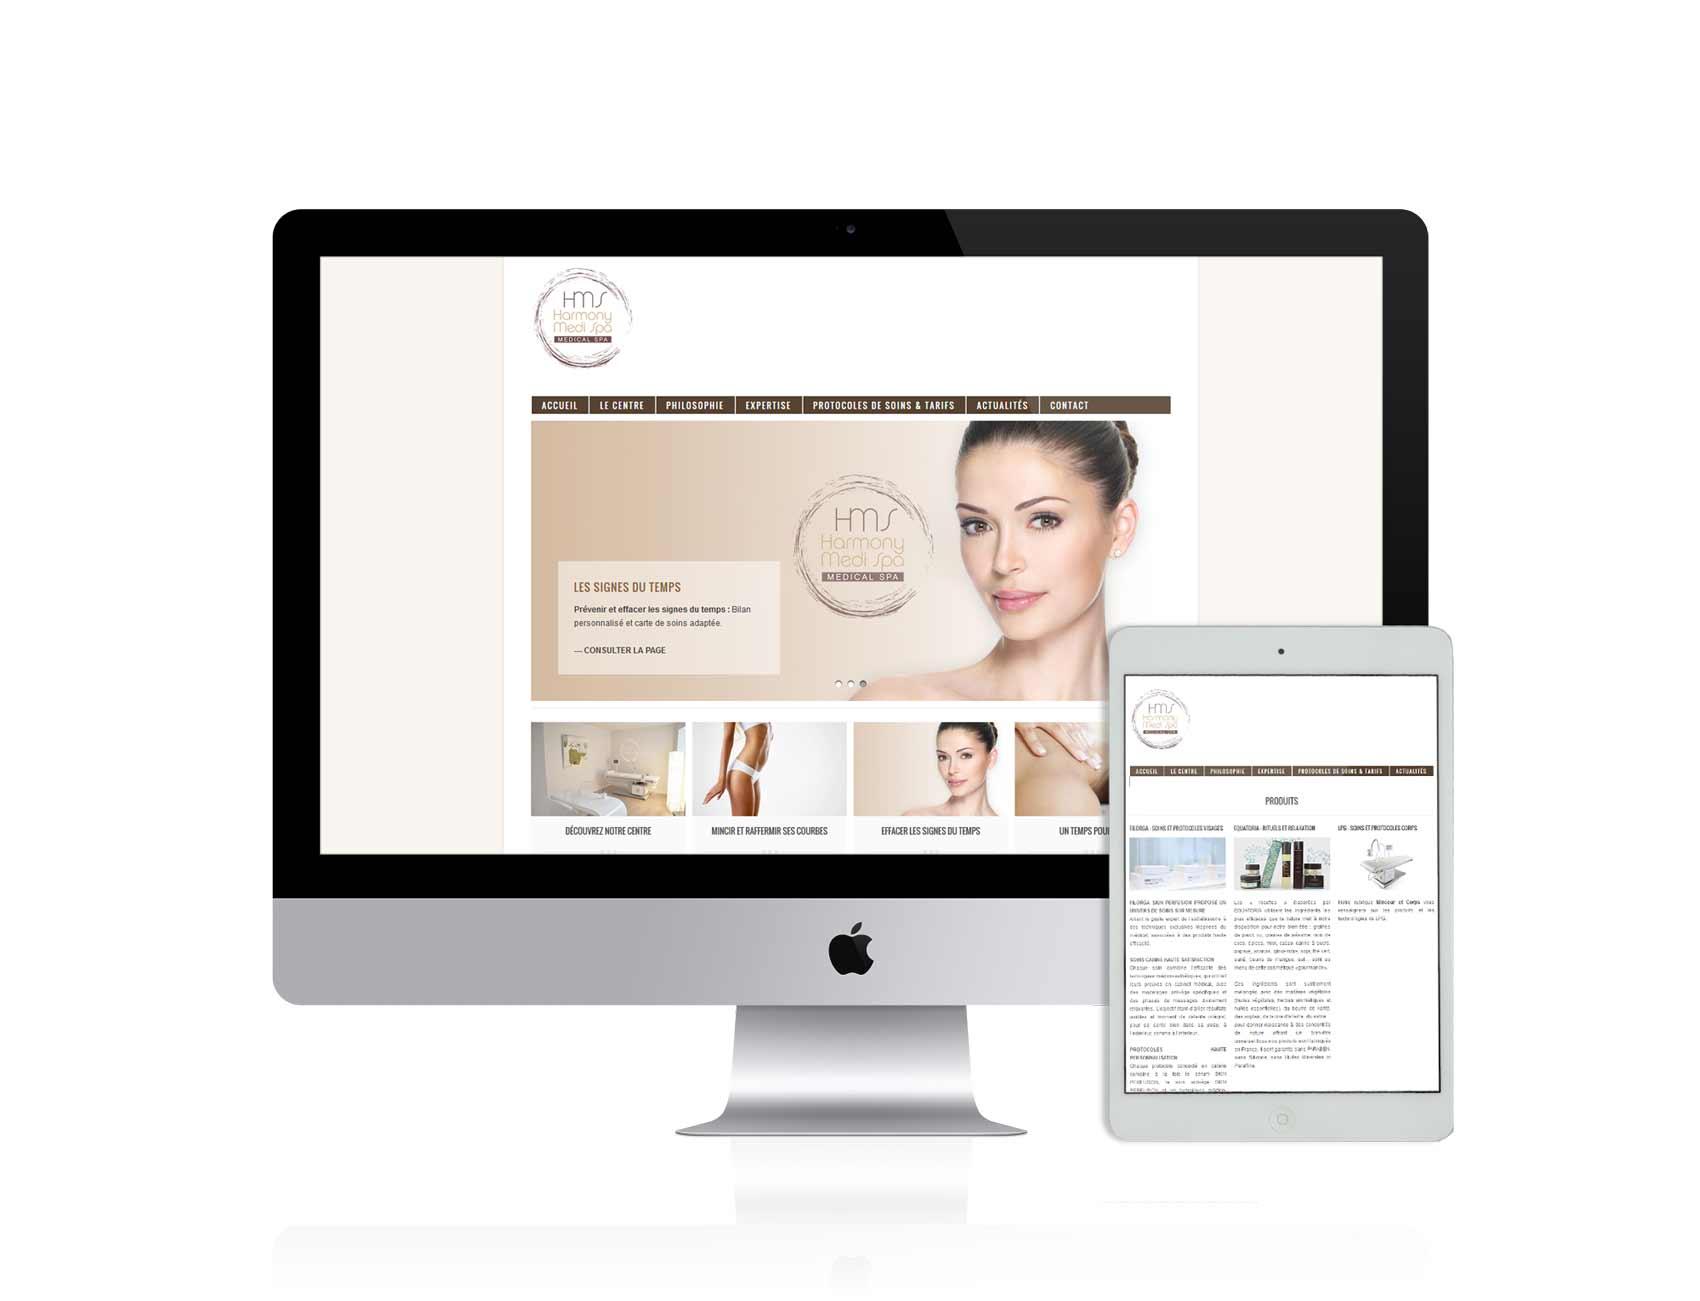 web-Mockup-hms-agence-sante-communication-karma-nice-paris